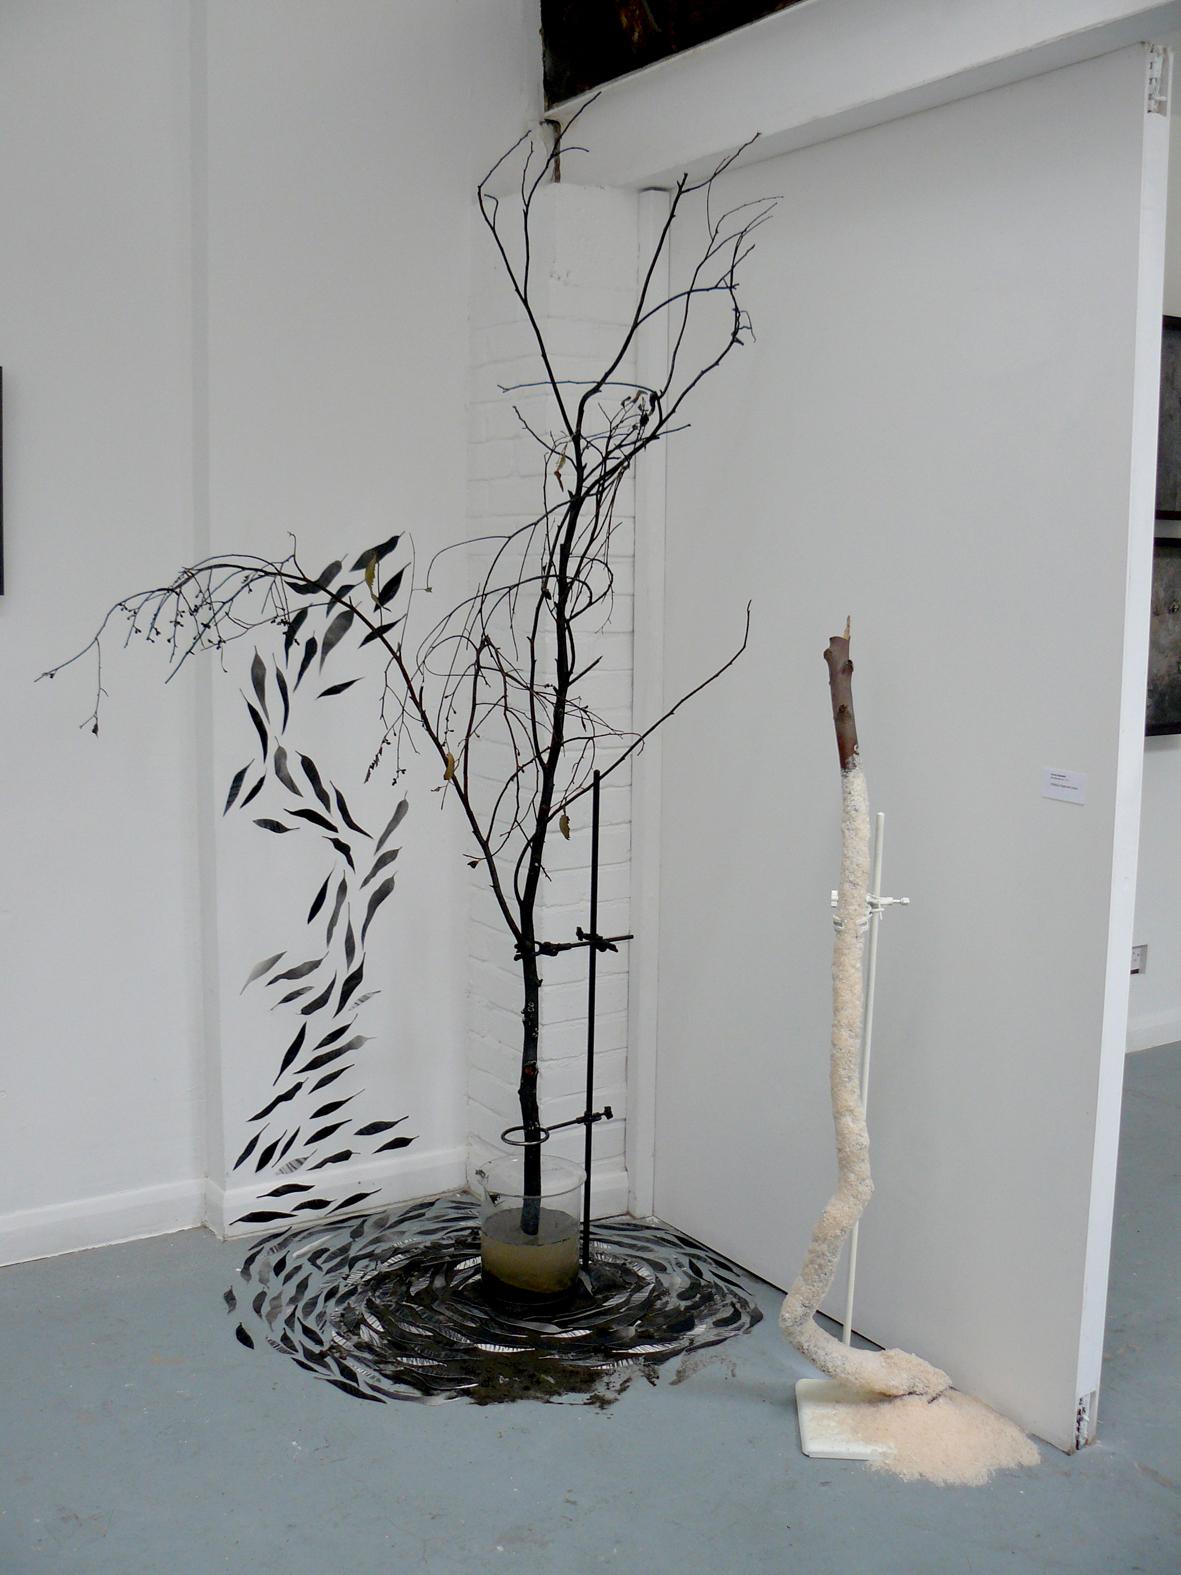 installation view, Landscape of Change exhibition 2011